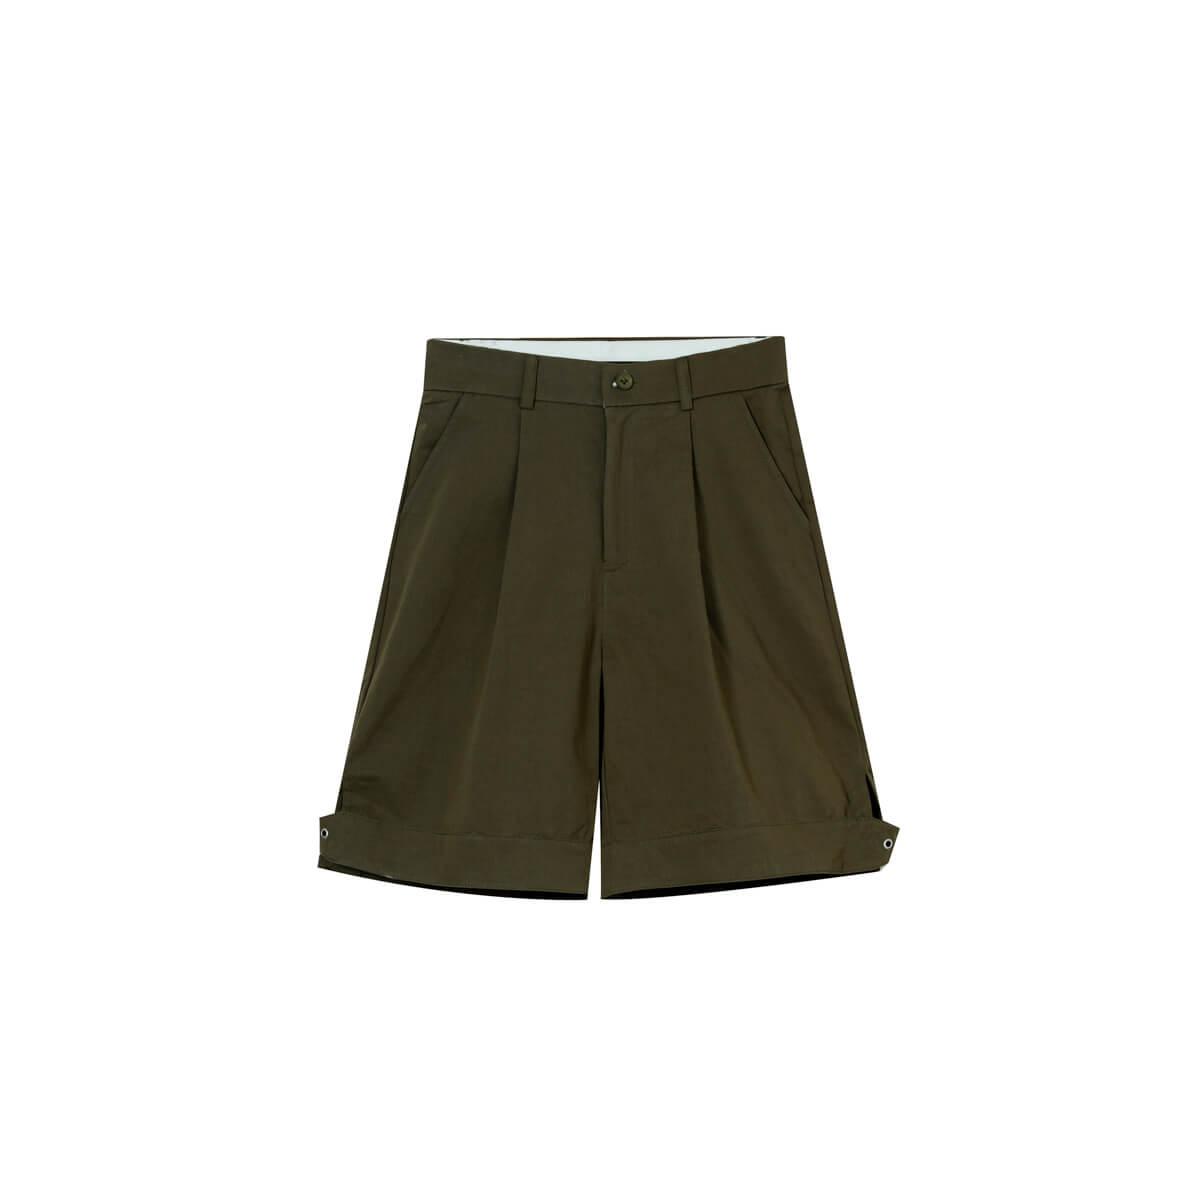 Шорты Cui Layout Studio Wide Leg Shorts Army Green